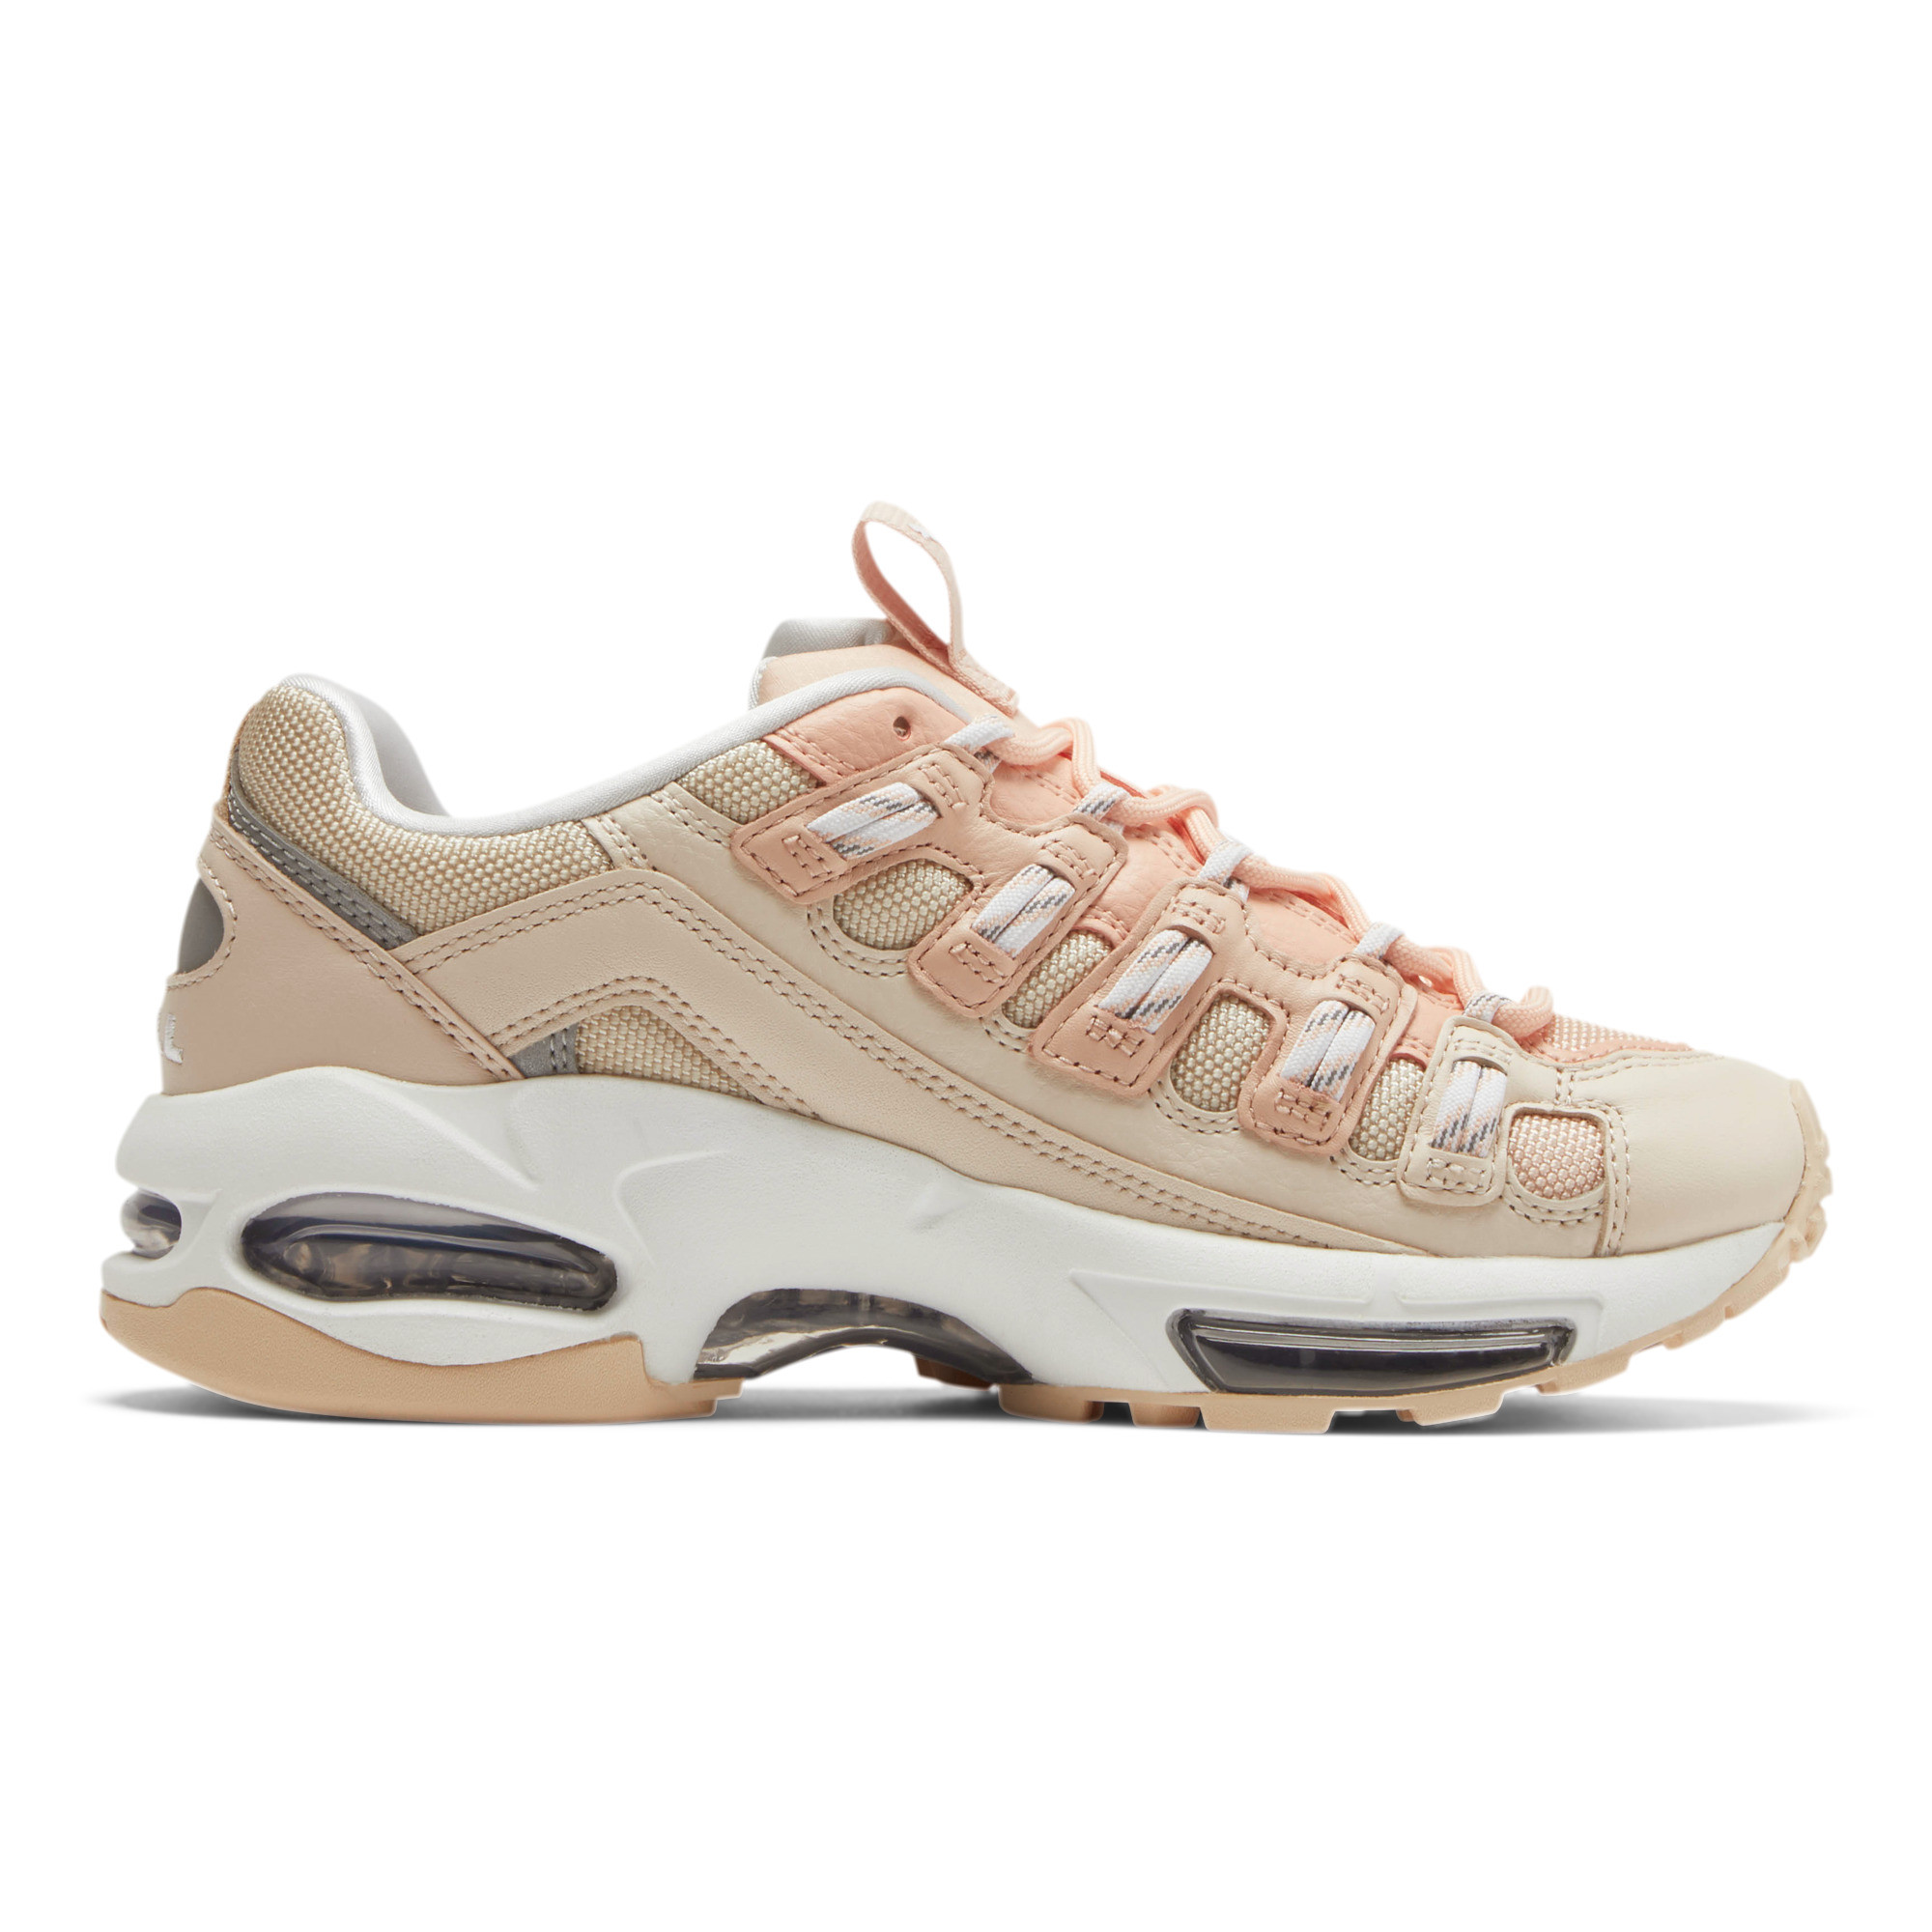 PUMA-CELL-Endura-Rebound-Women-039-s-Sneakers-Women-Shoe-Sport-Classics thumbnail 12